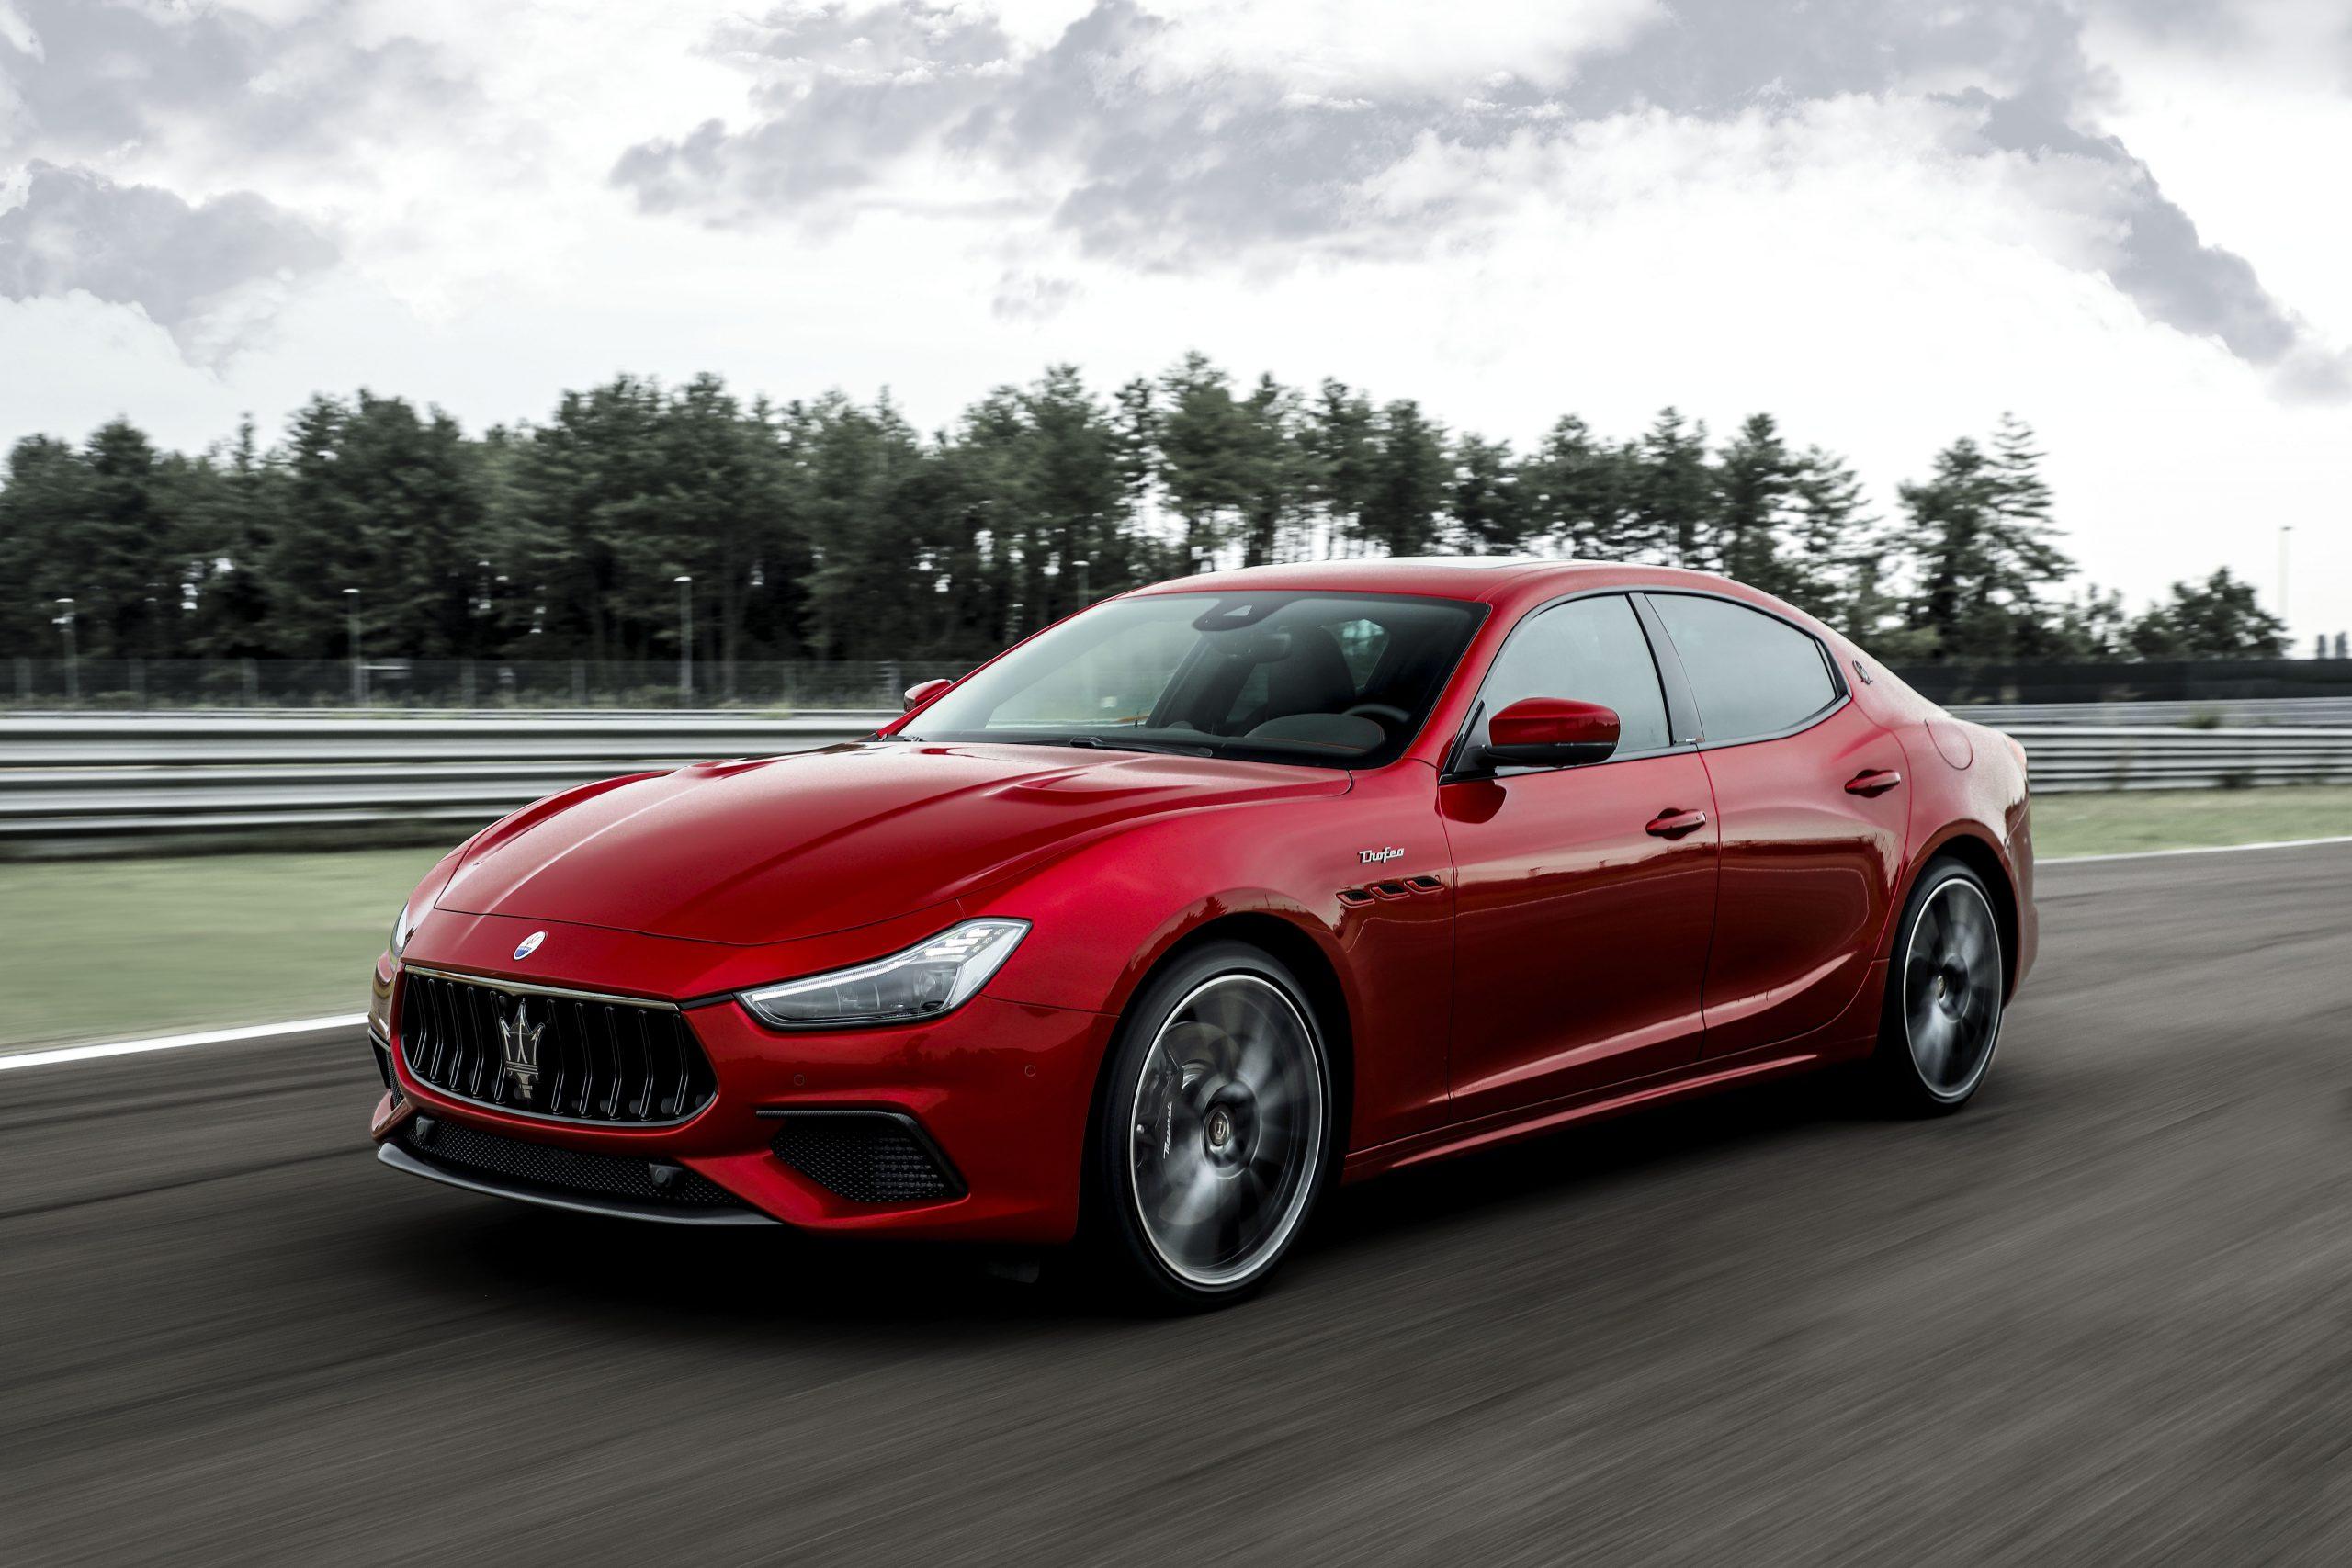 Fastest Four-Door Cars - 2021 Maserati Ghibli Trofeo